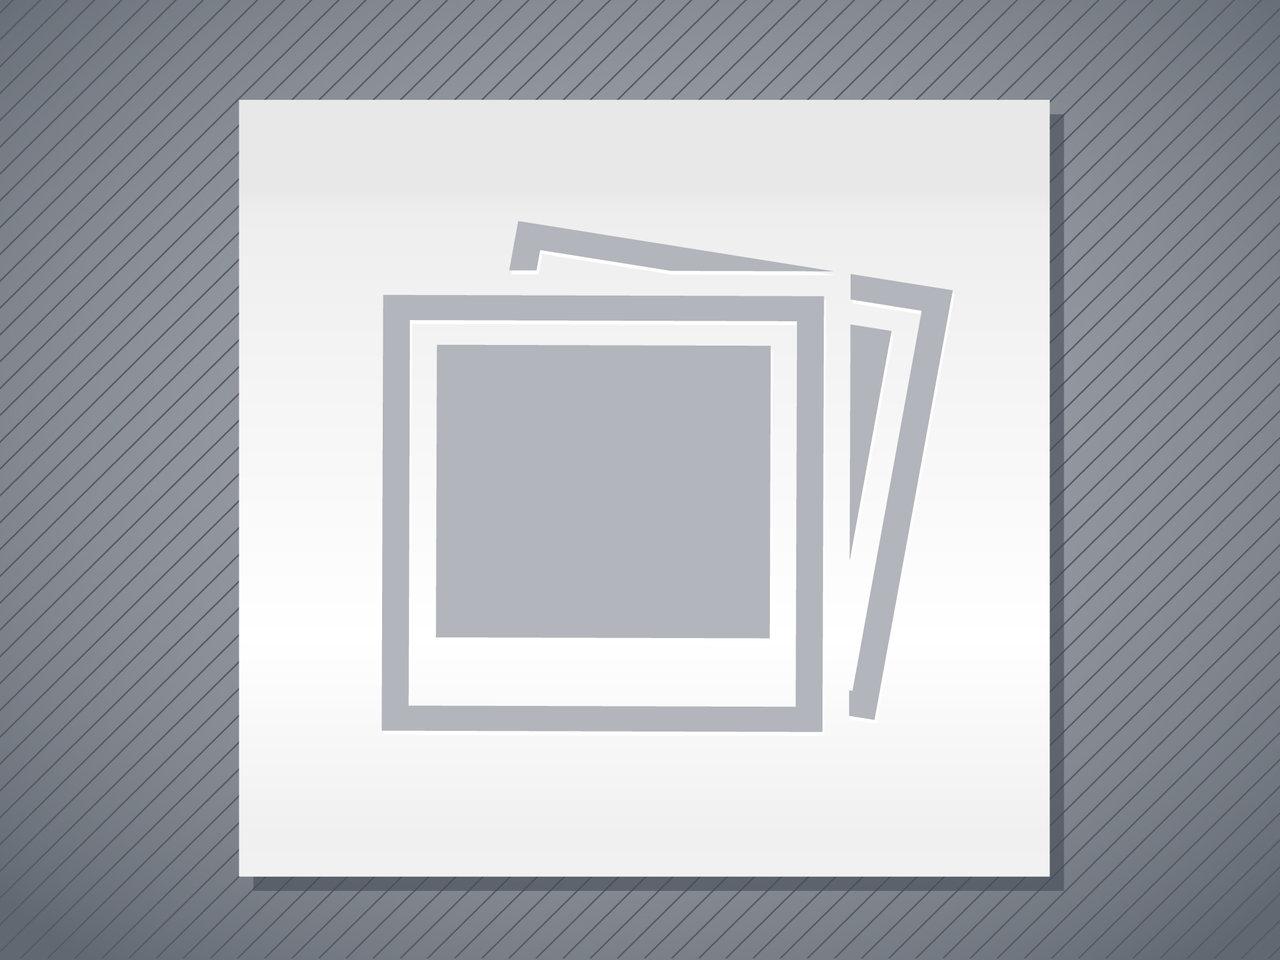 Image of keyboard with social media logos on keys.